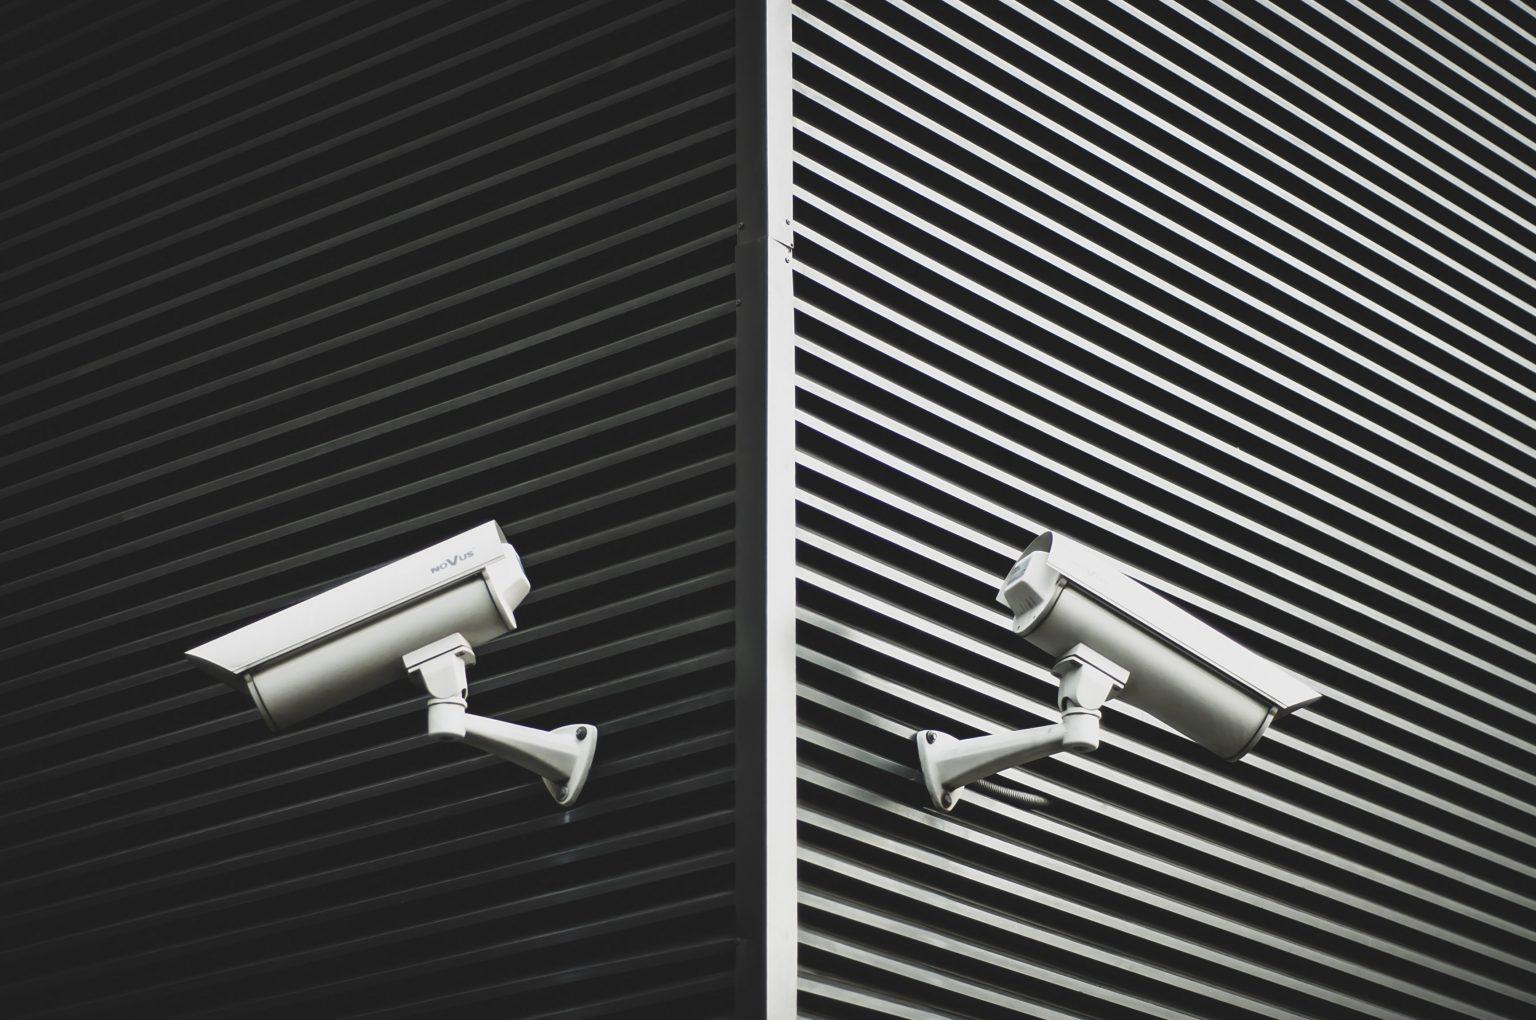 Announcing the Counter-Surveillance Resource Center